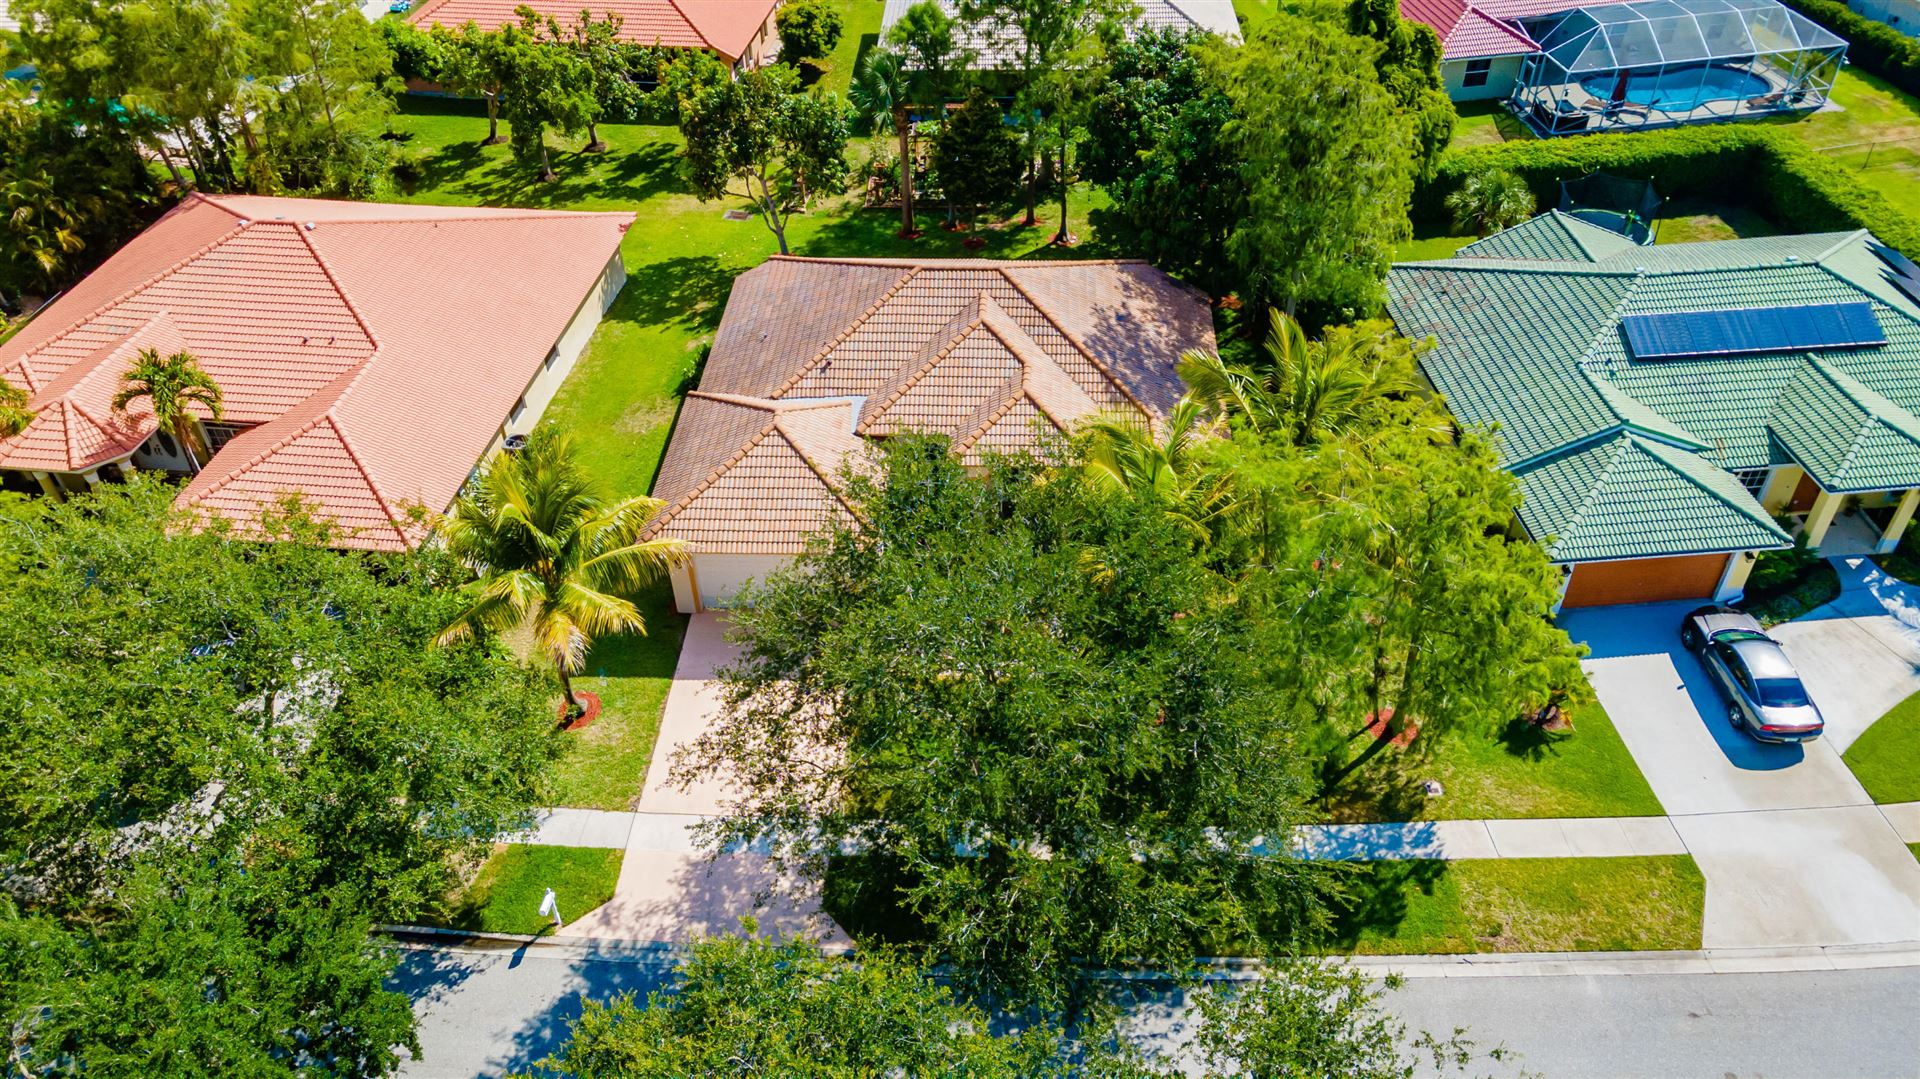 115 Kapok Crescent, Royal Palm Beach, FL 33411 - MLS#: RX-10716926